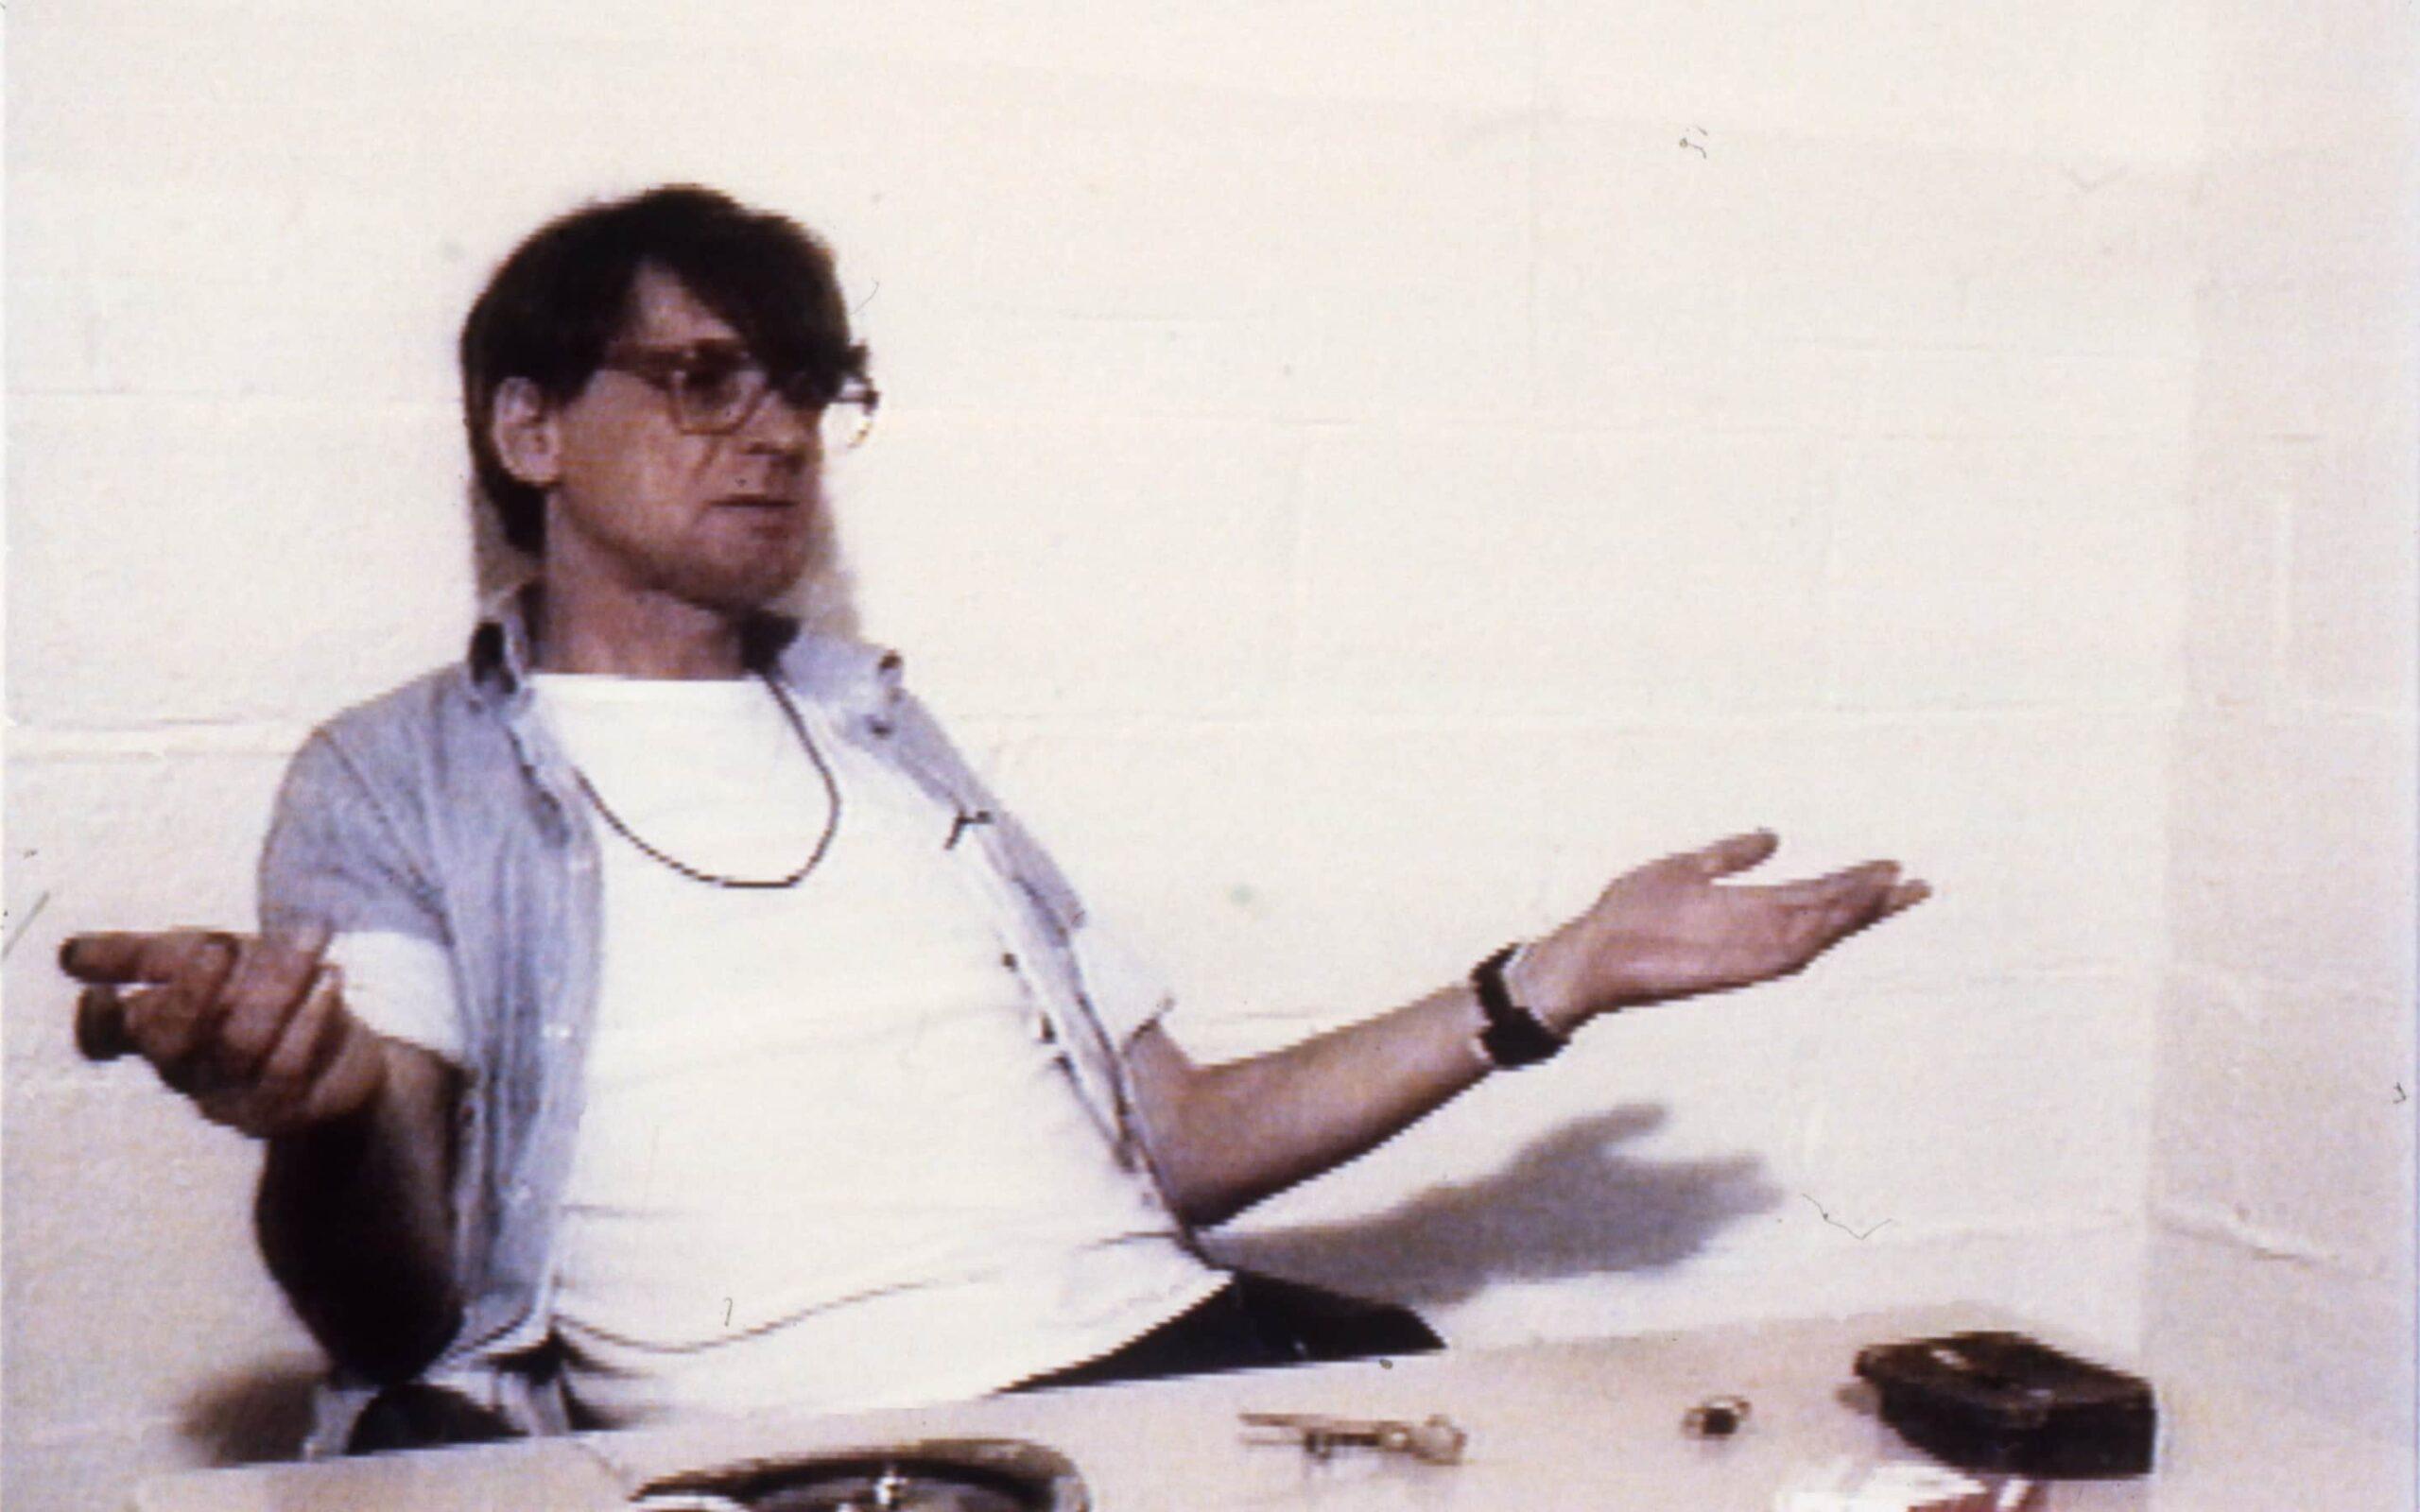 Dennis Nielsen asesino tv serie inglaterra televisión